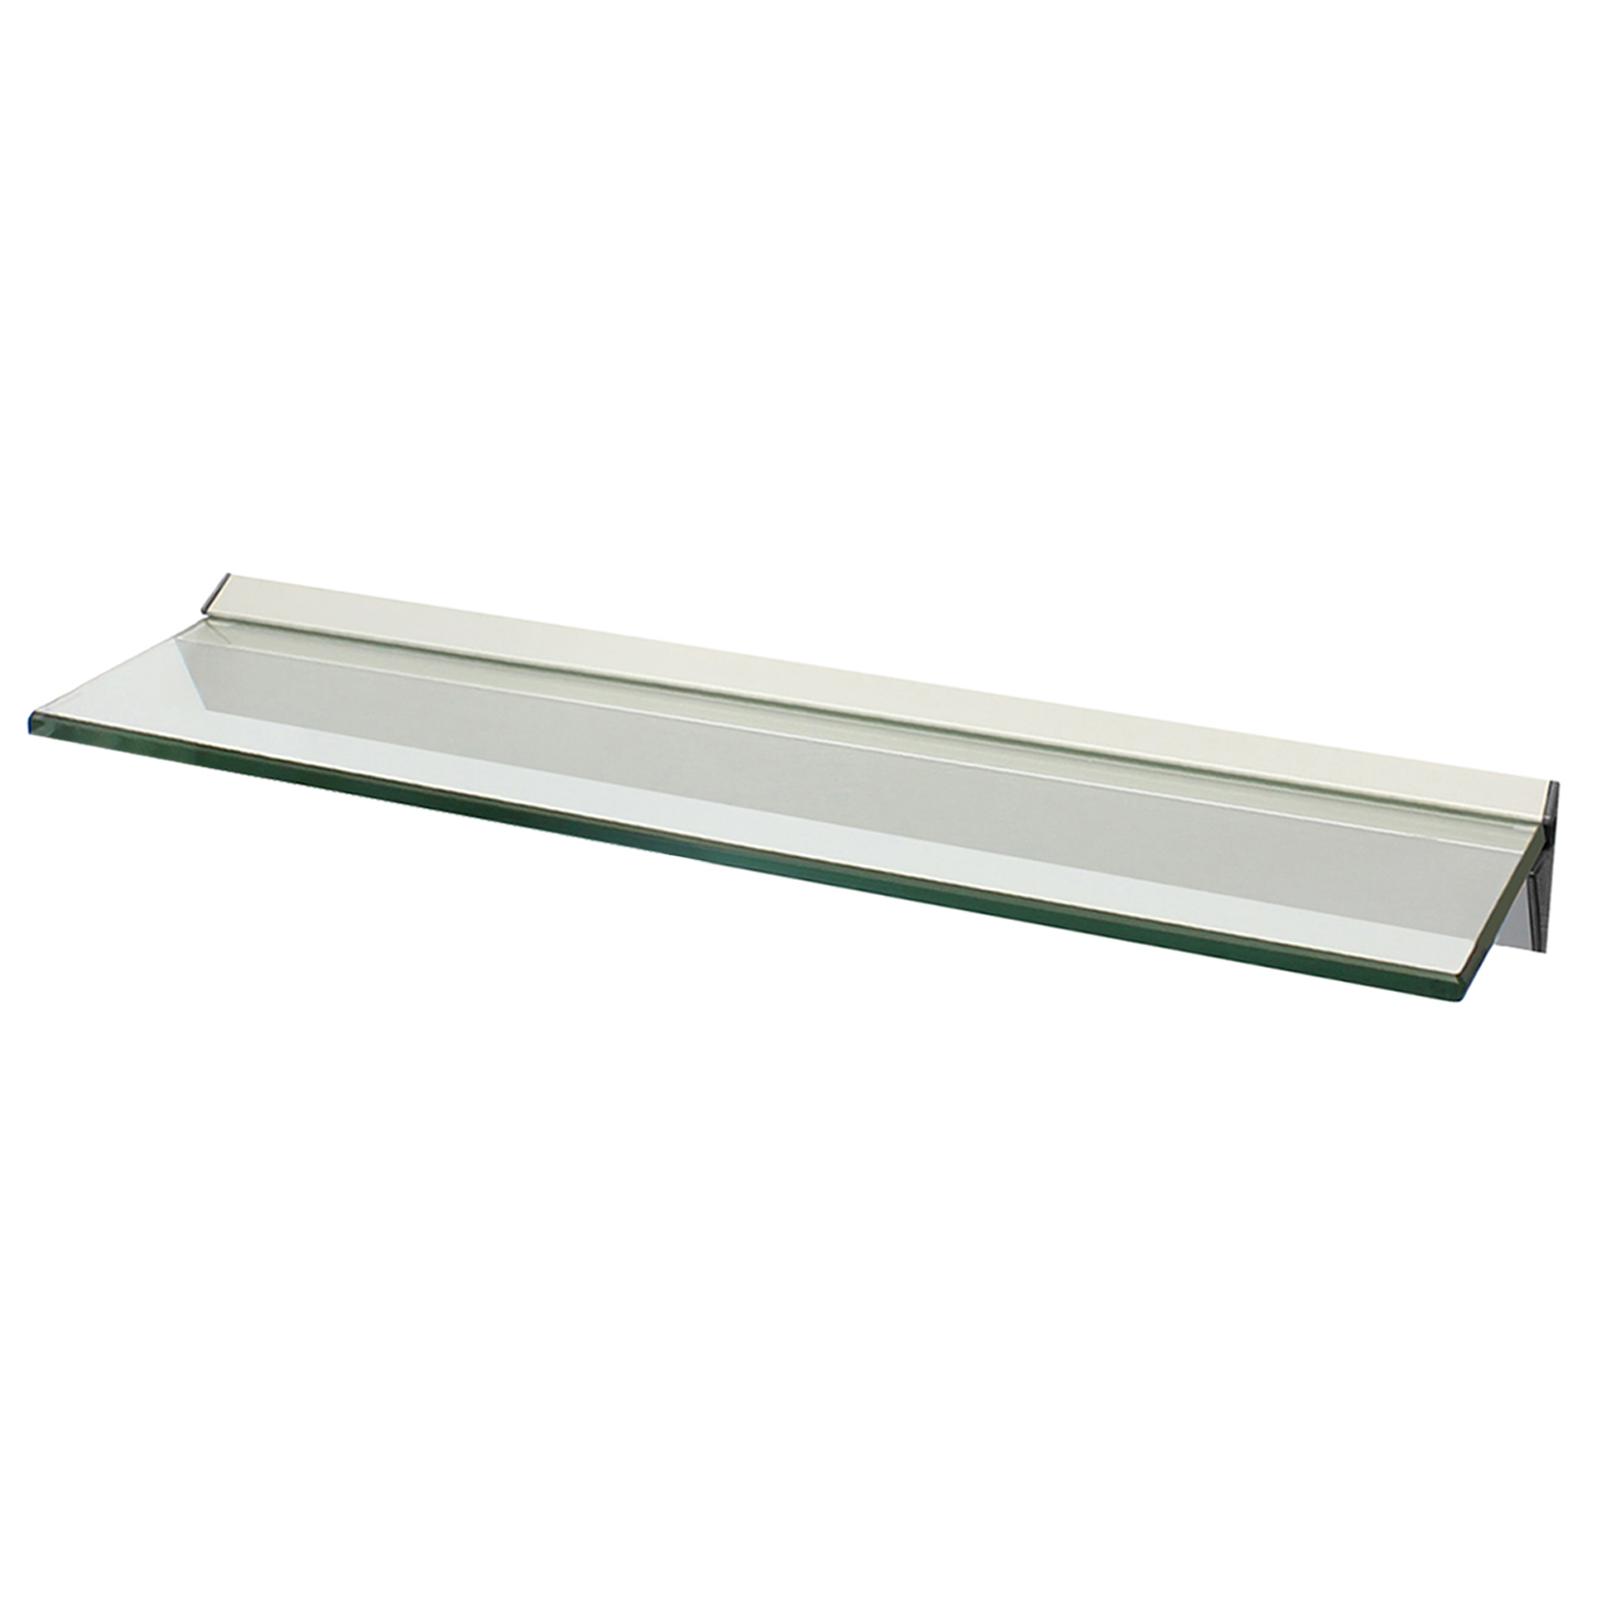 Narrow Bathroom Wall Storage: NARROW FLOATING GLASS WALL SHELF BATHROOM/KITCHEN/LOUNGE